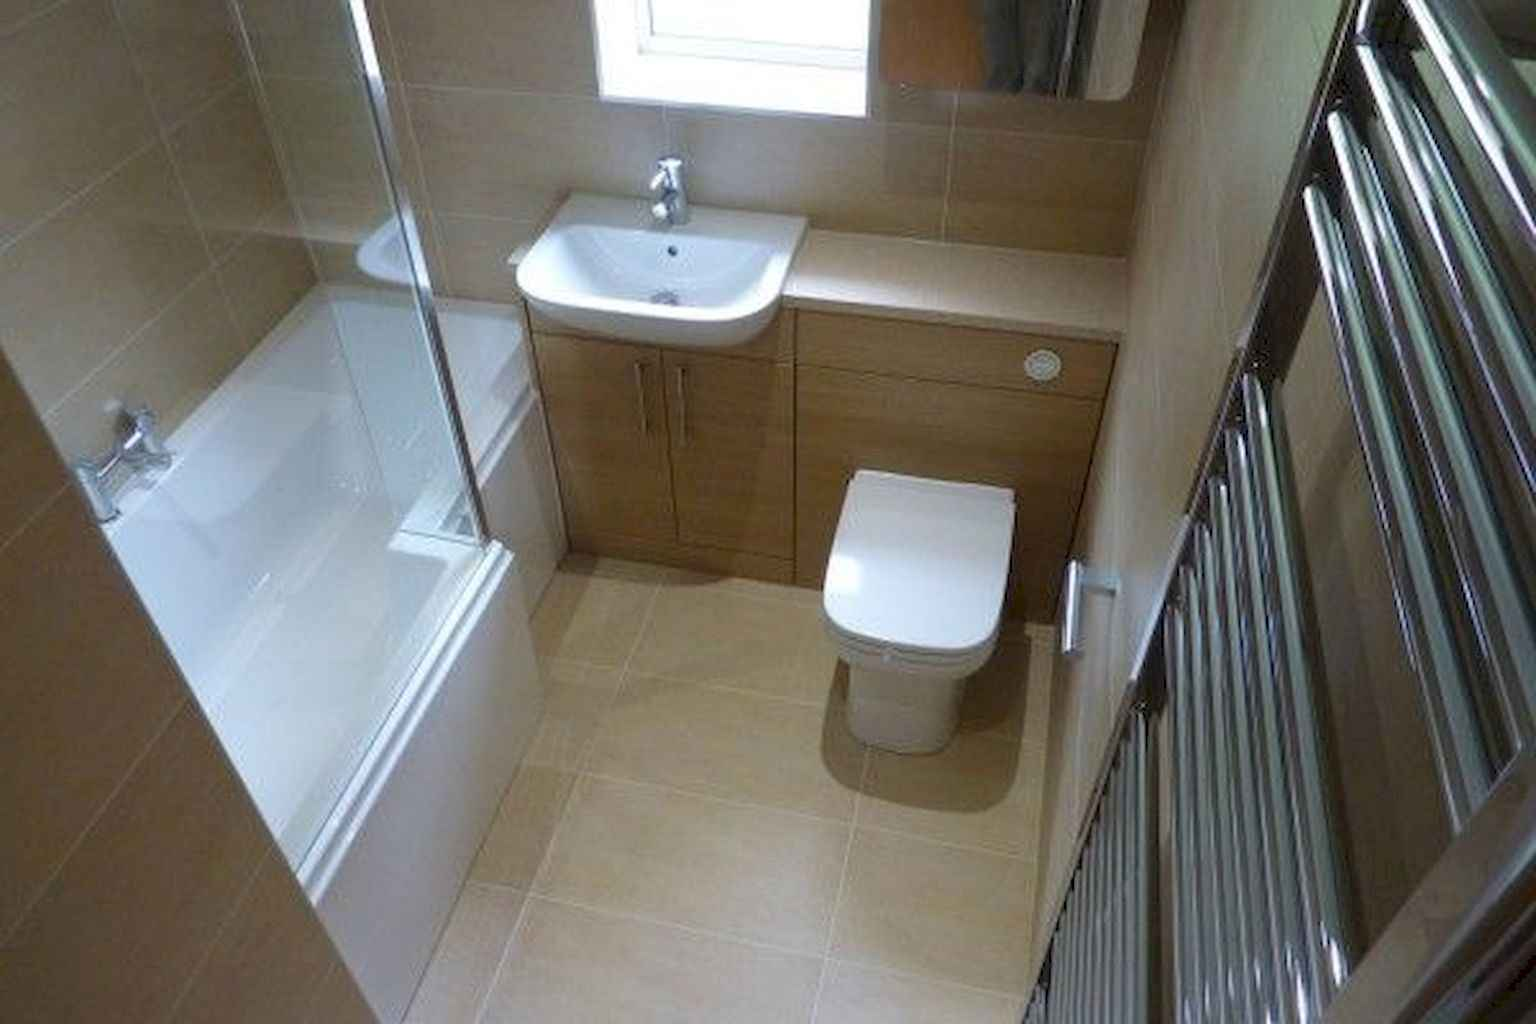 111 Brilliant Small Bathroom Remodel Ideas On A Budget (50)